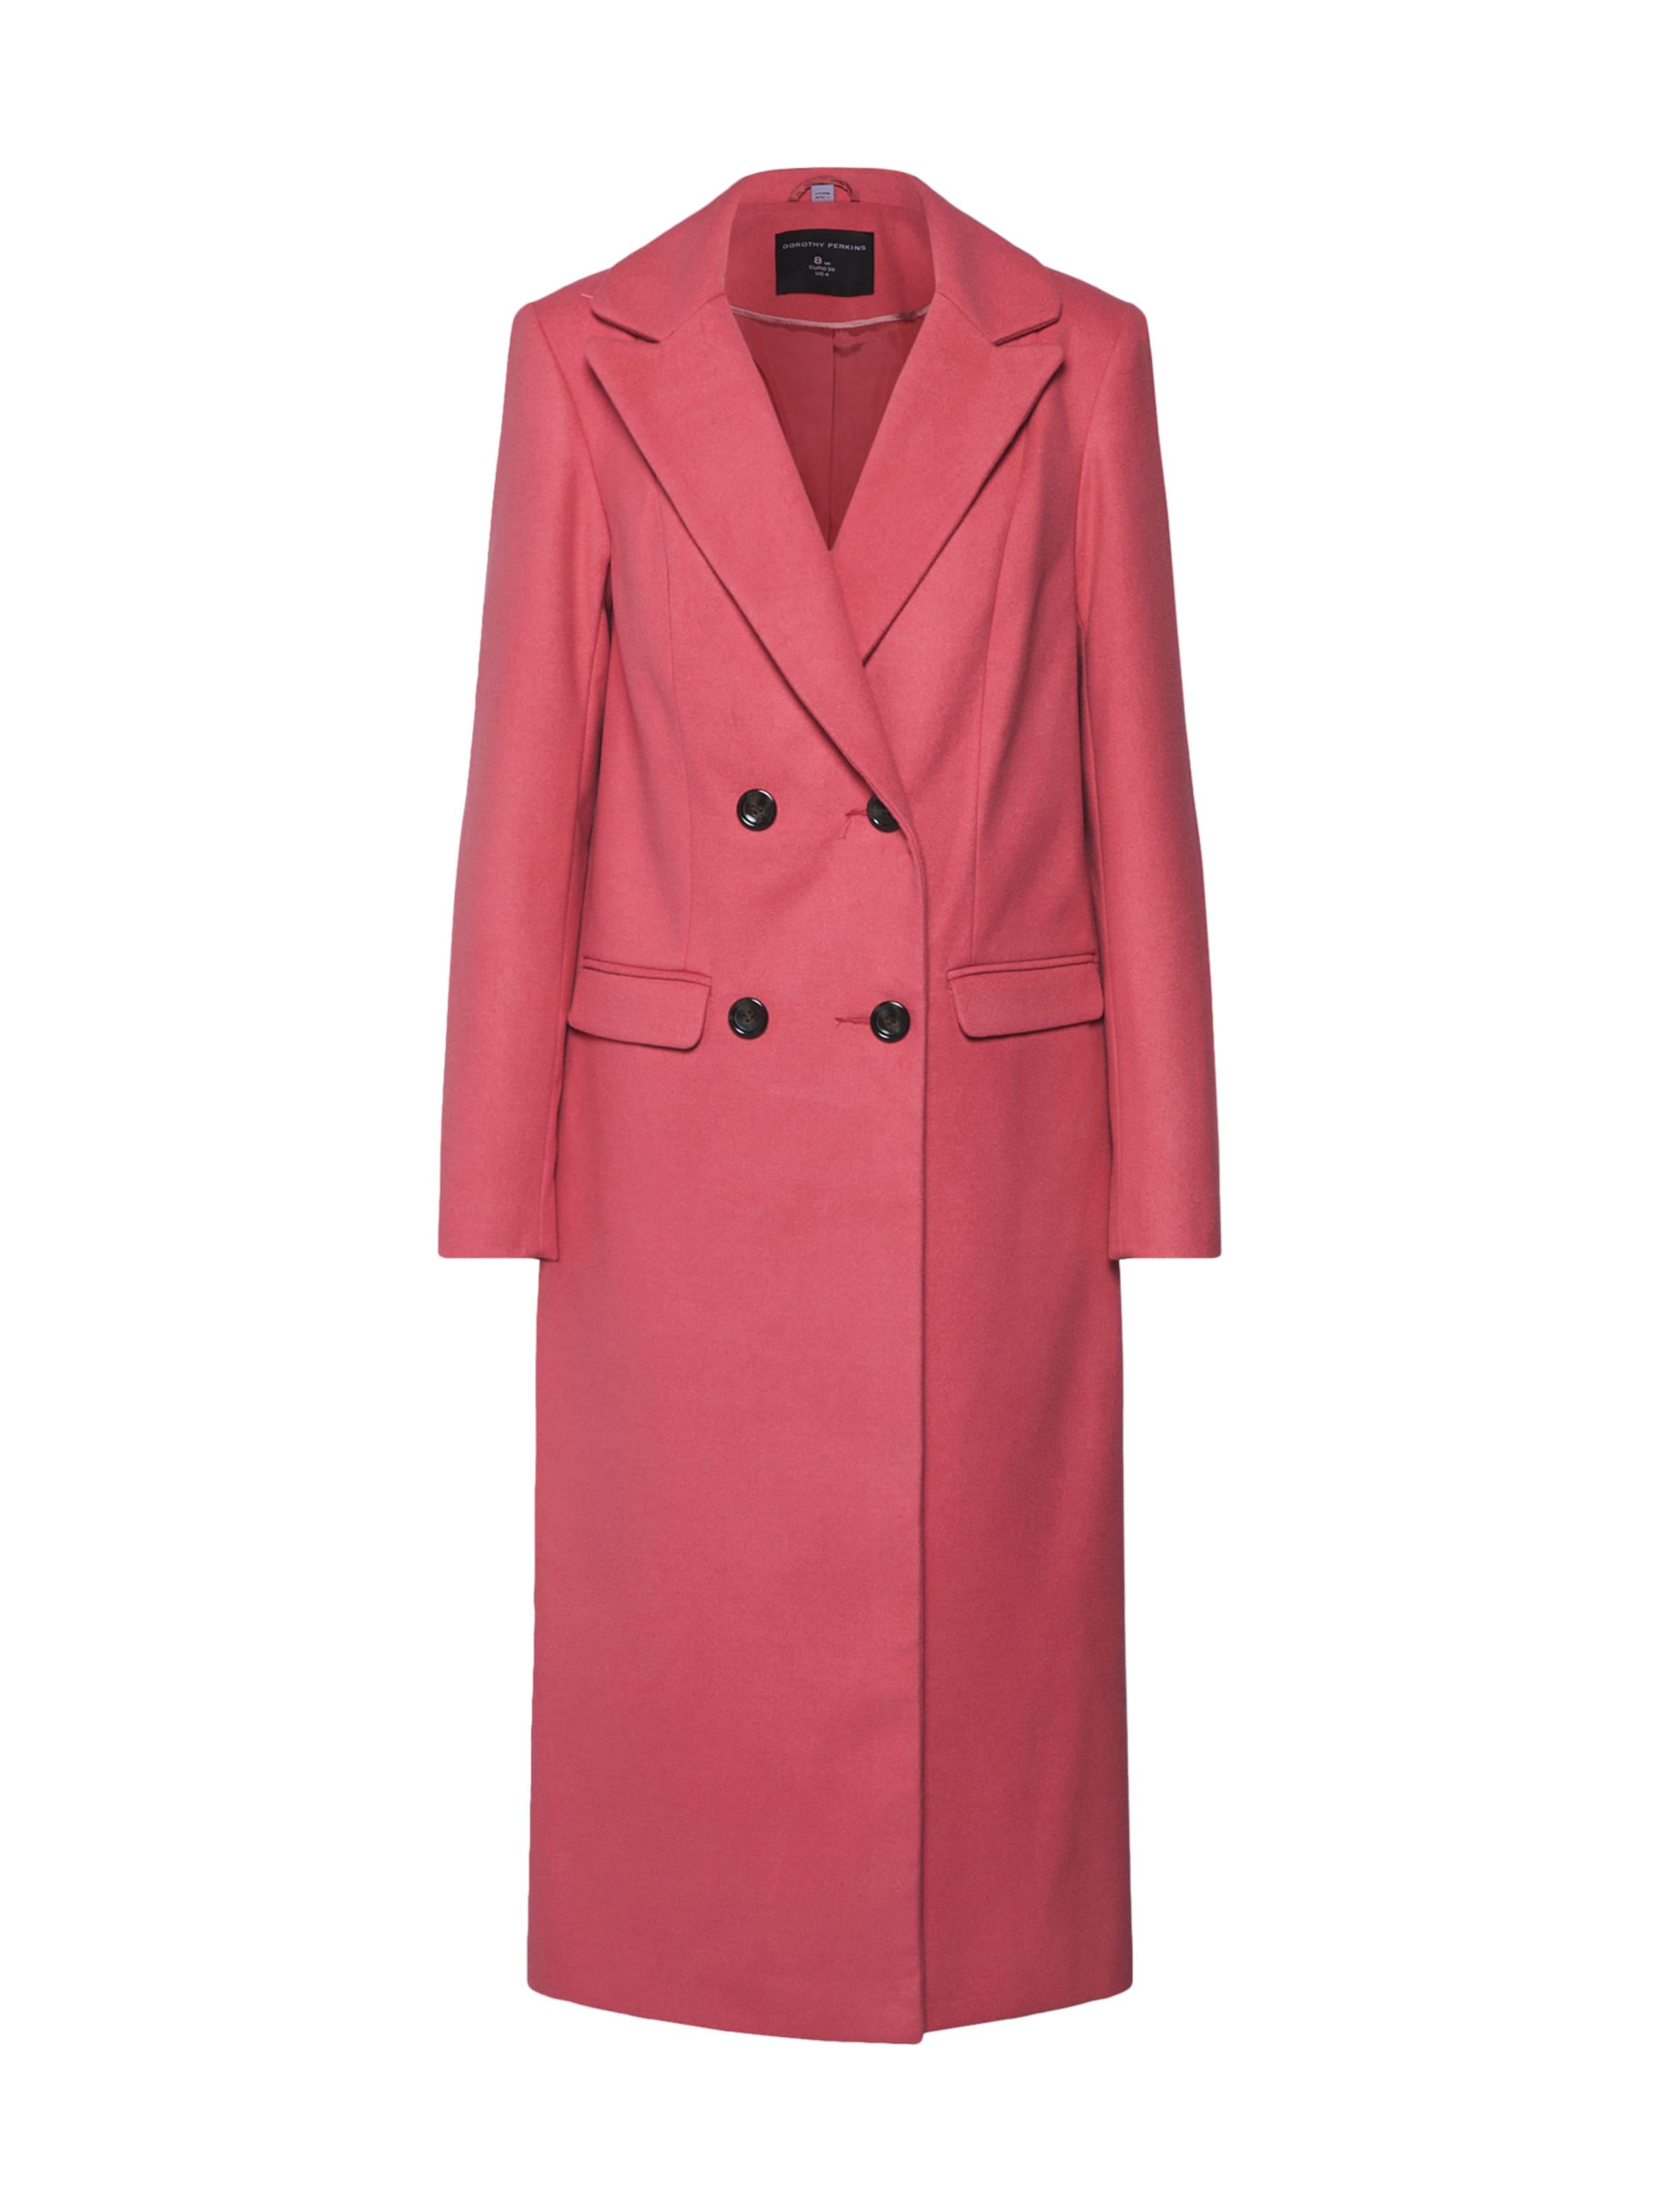 Dorothy Perkins 'colour Mantel Pink Crombie' In zVqSMpU